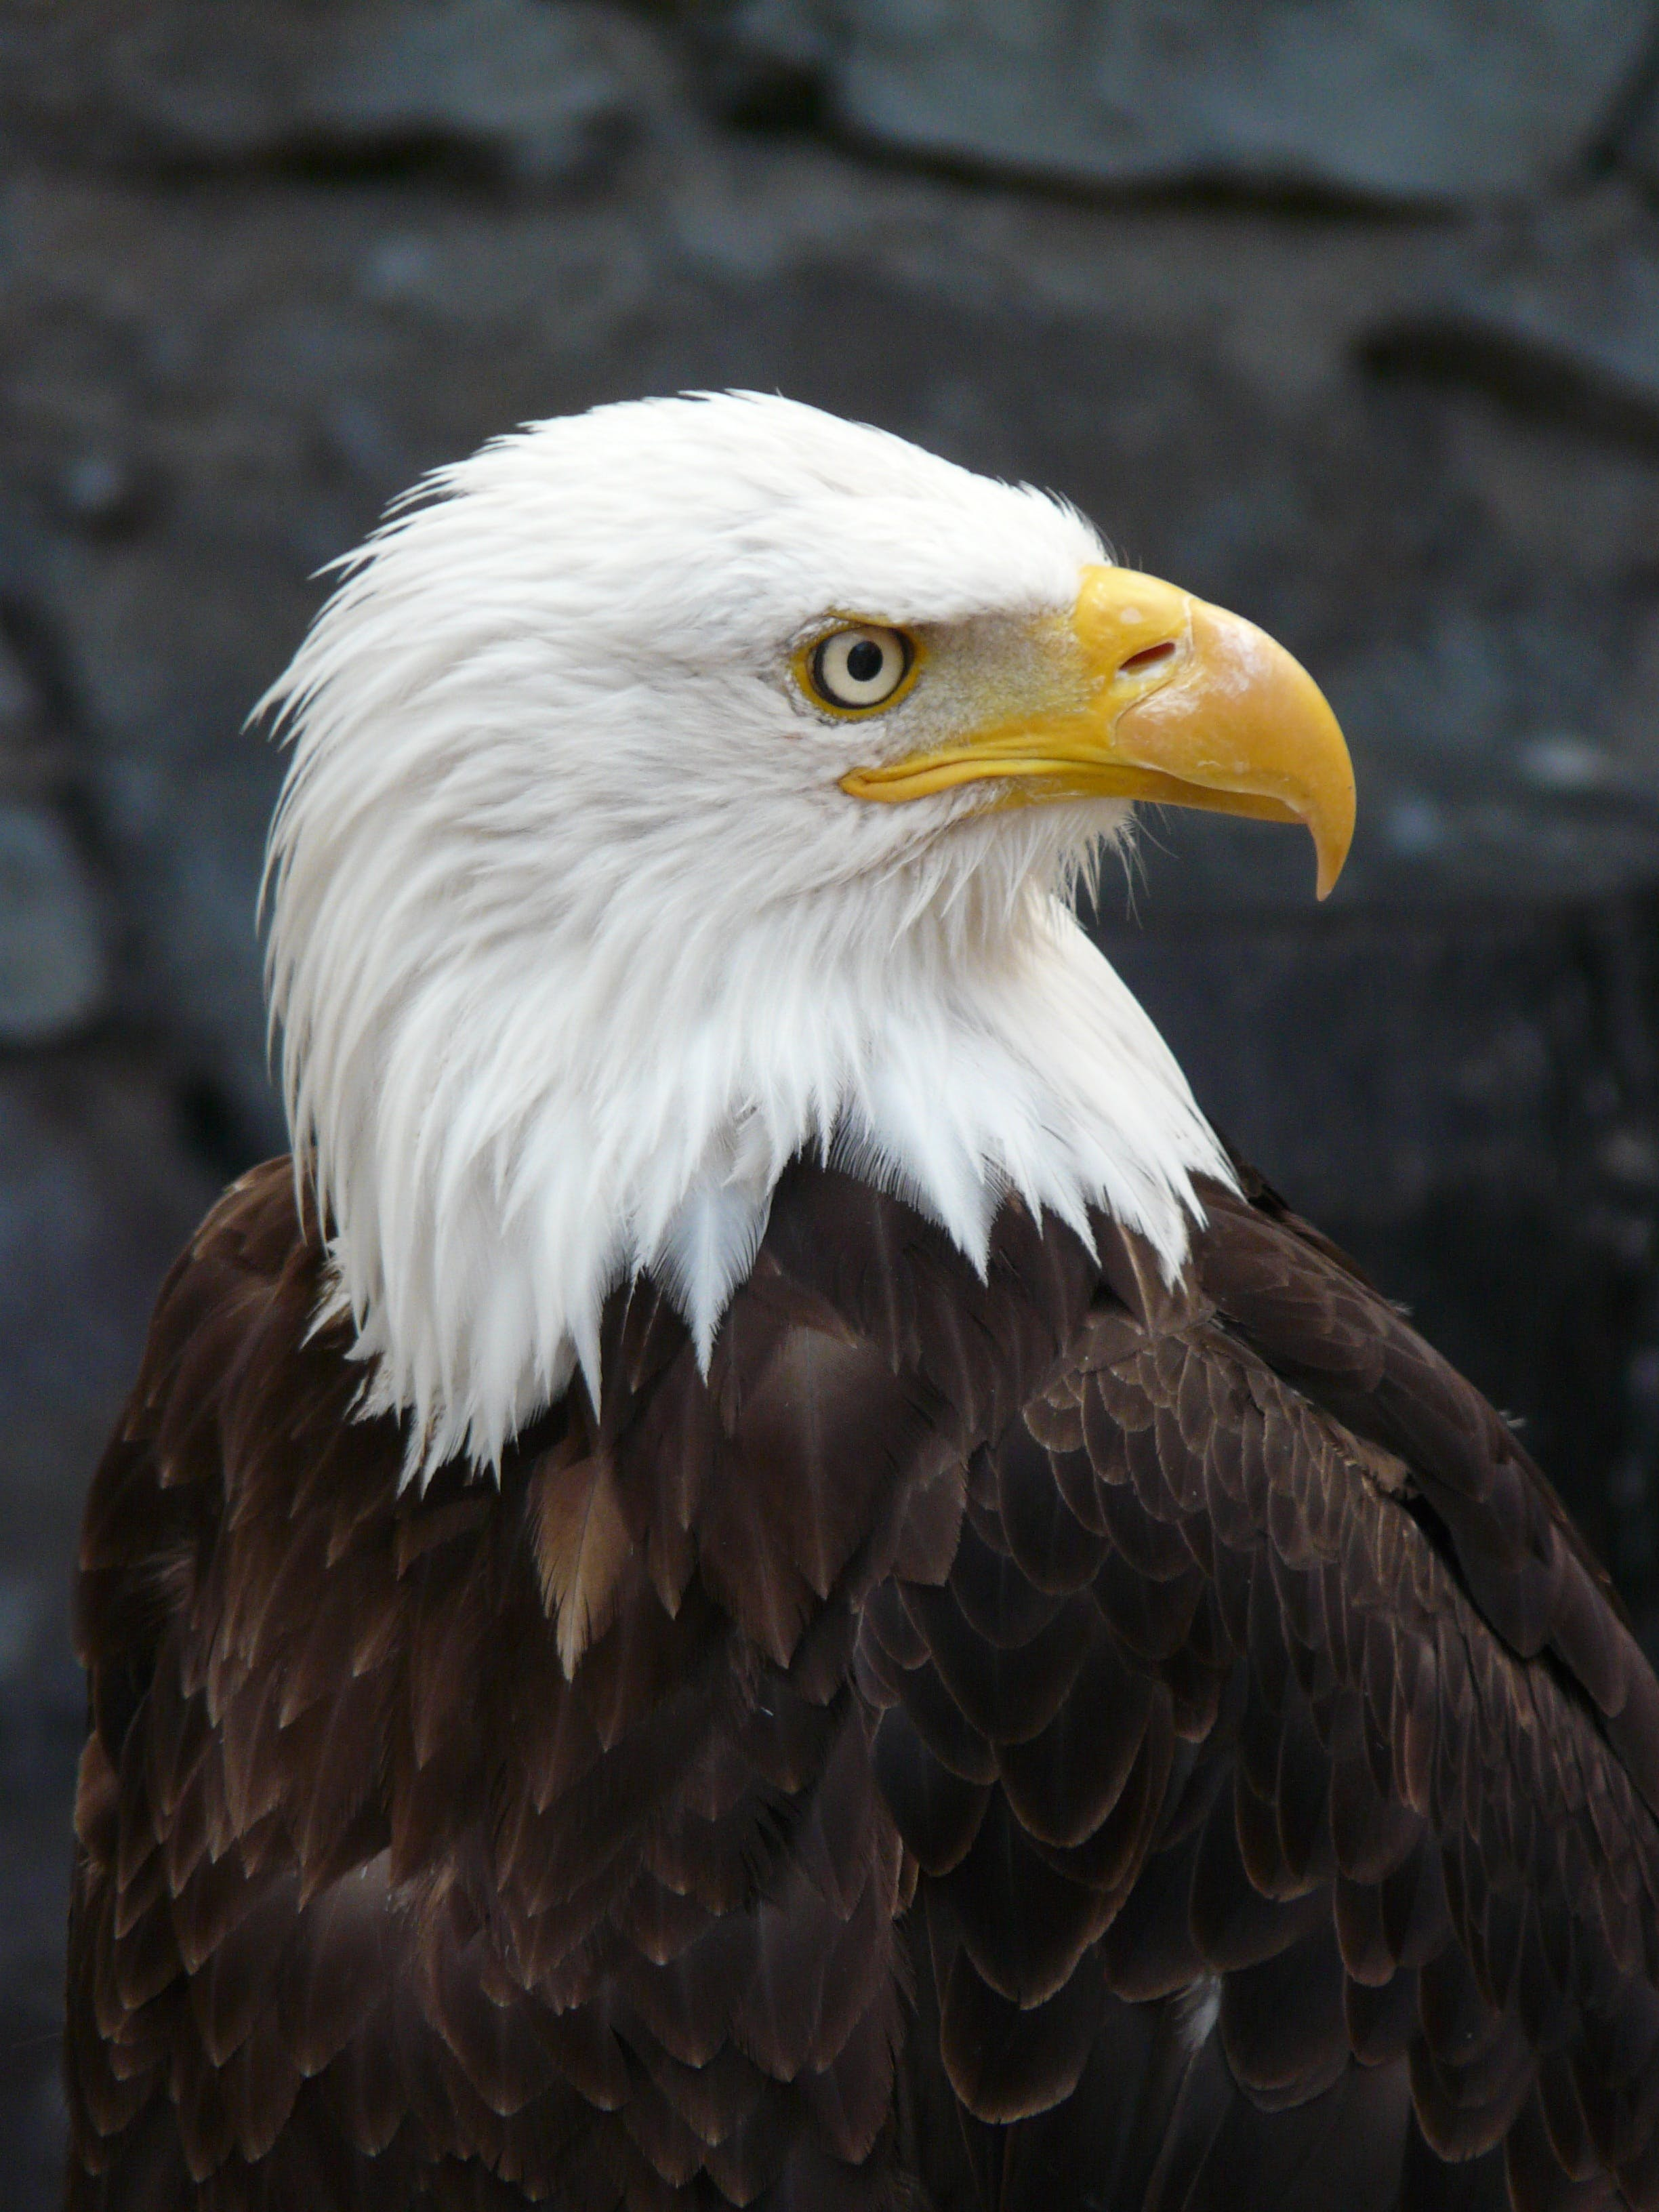 Free stock photo of nature, bird, eagle, raptor